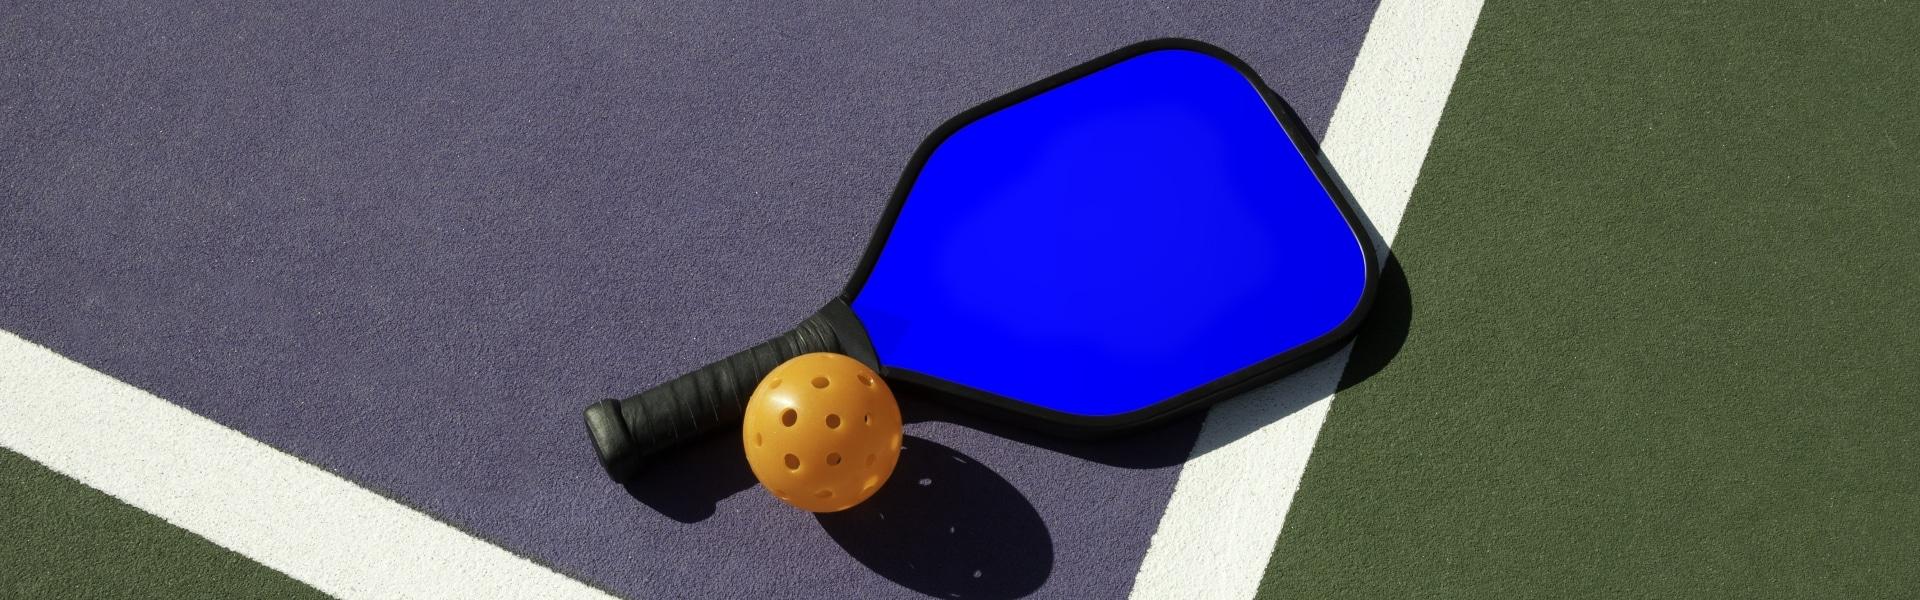 Best Pickleball Paddles Reviewed in Detail